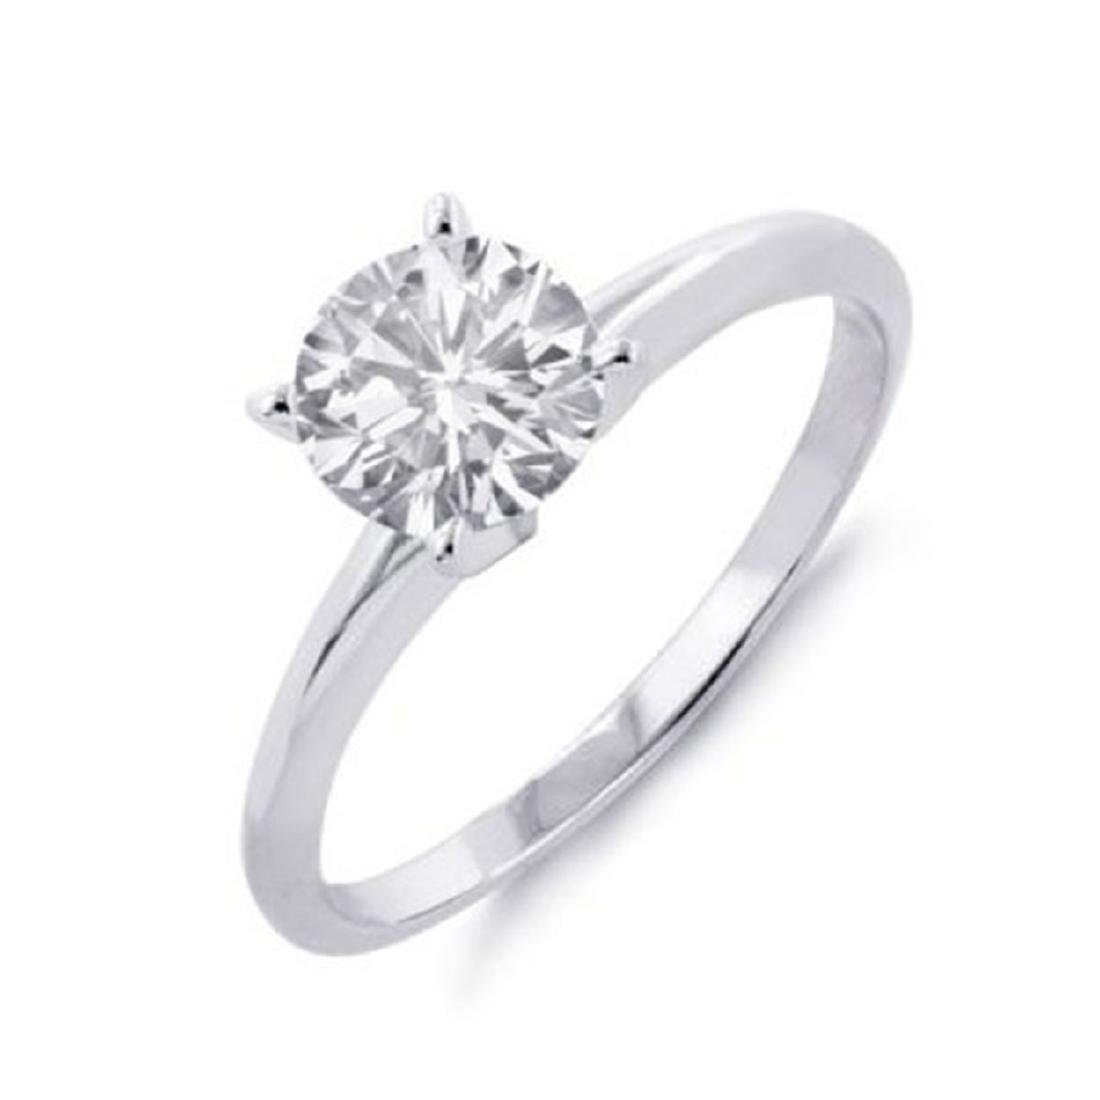 0.50 ctw VS/SI Diamond Solitaire Ring 14K White Gold -